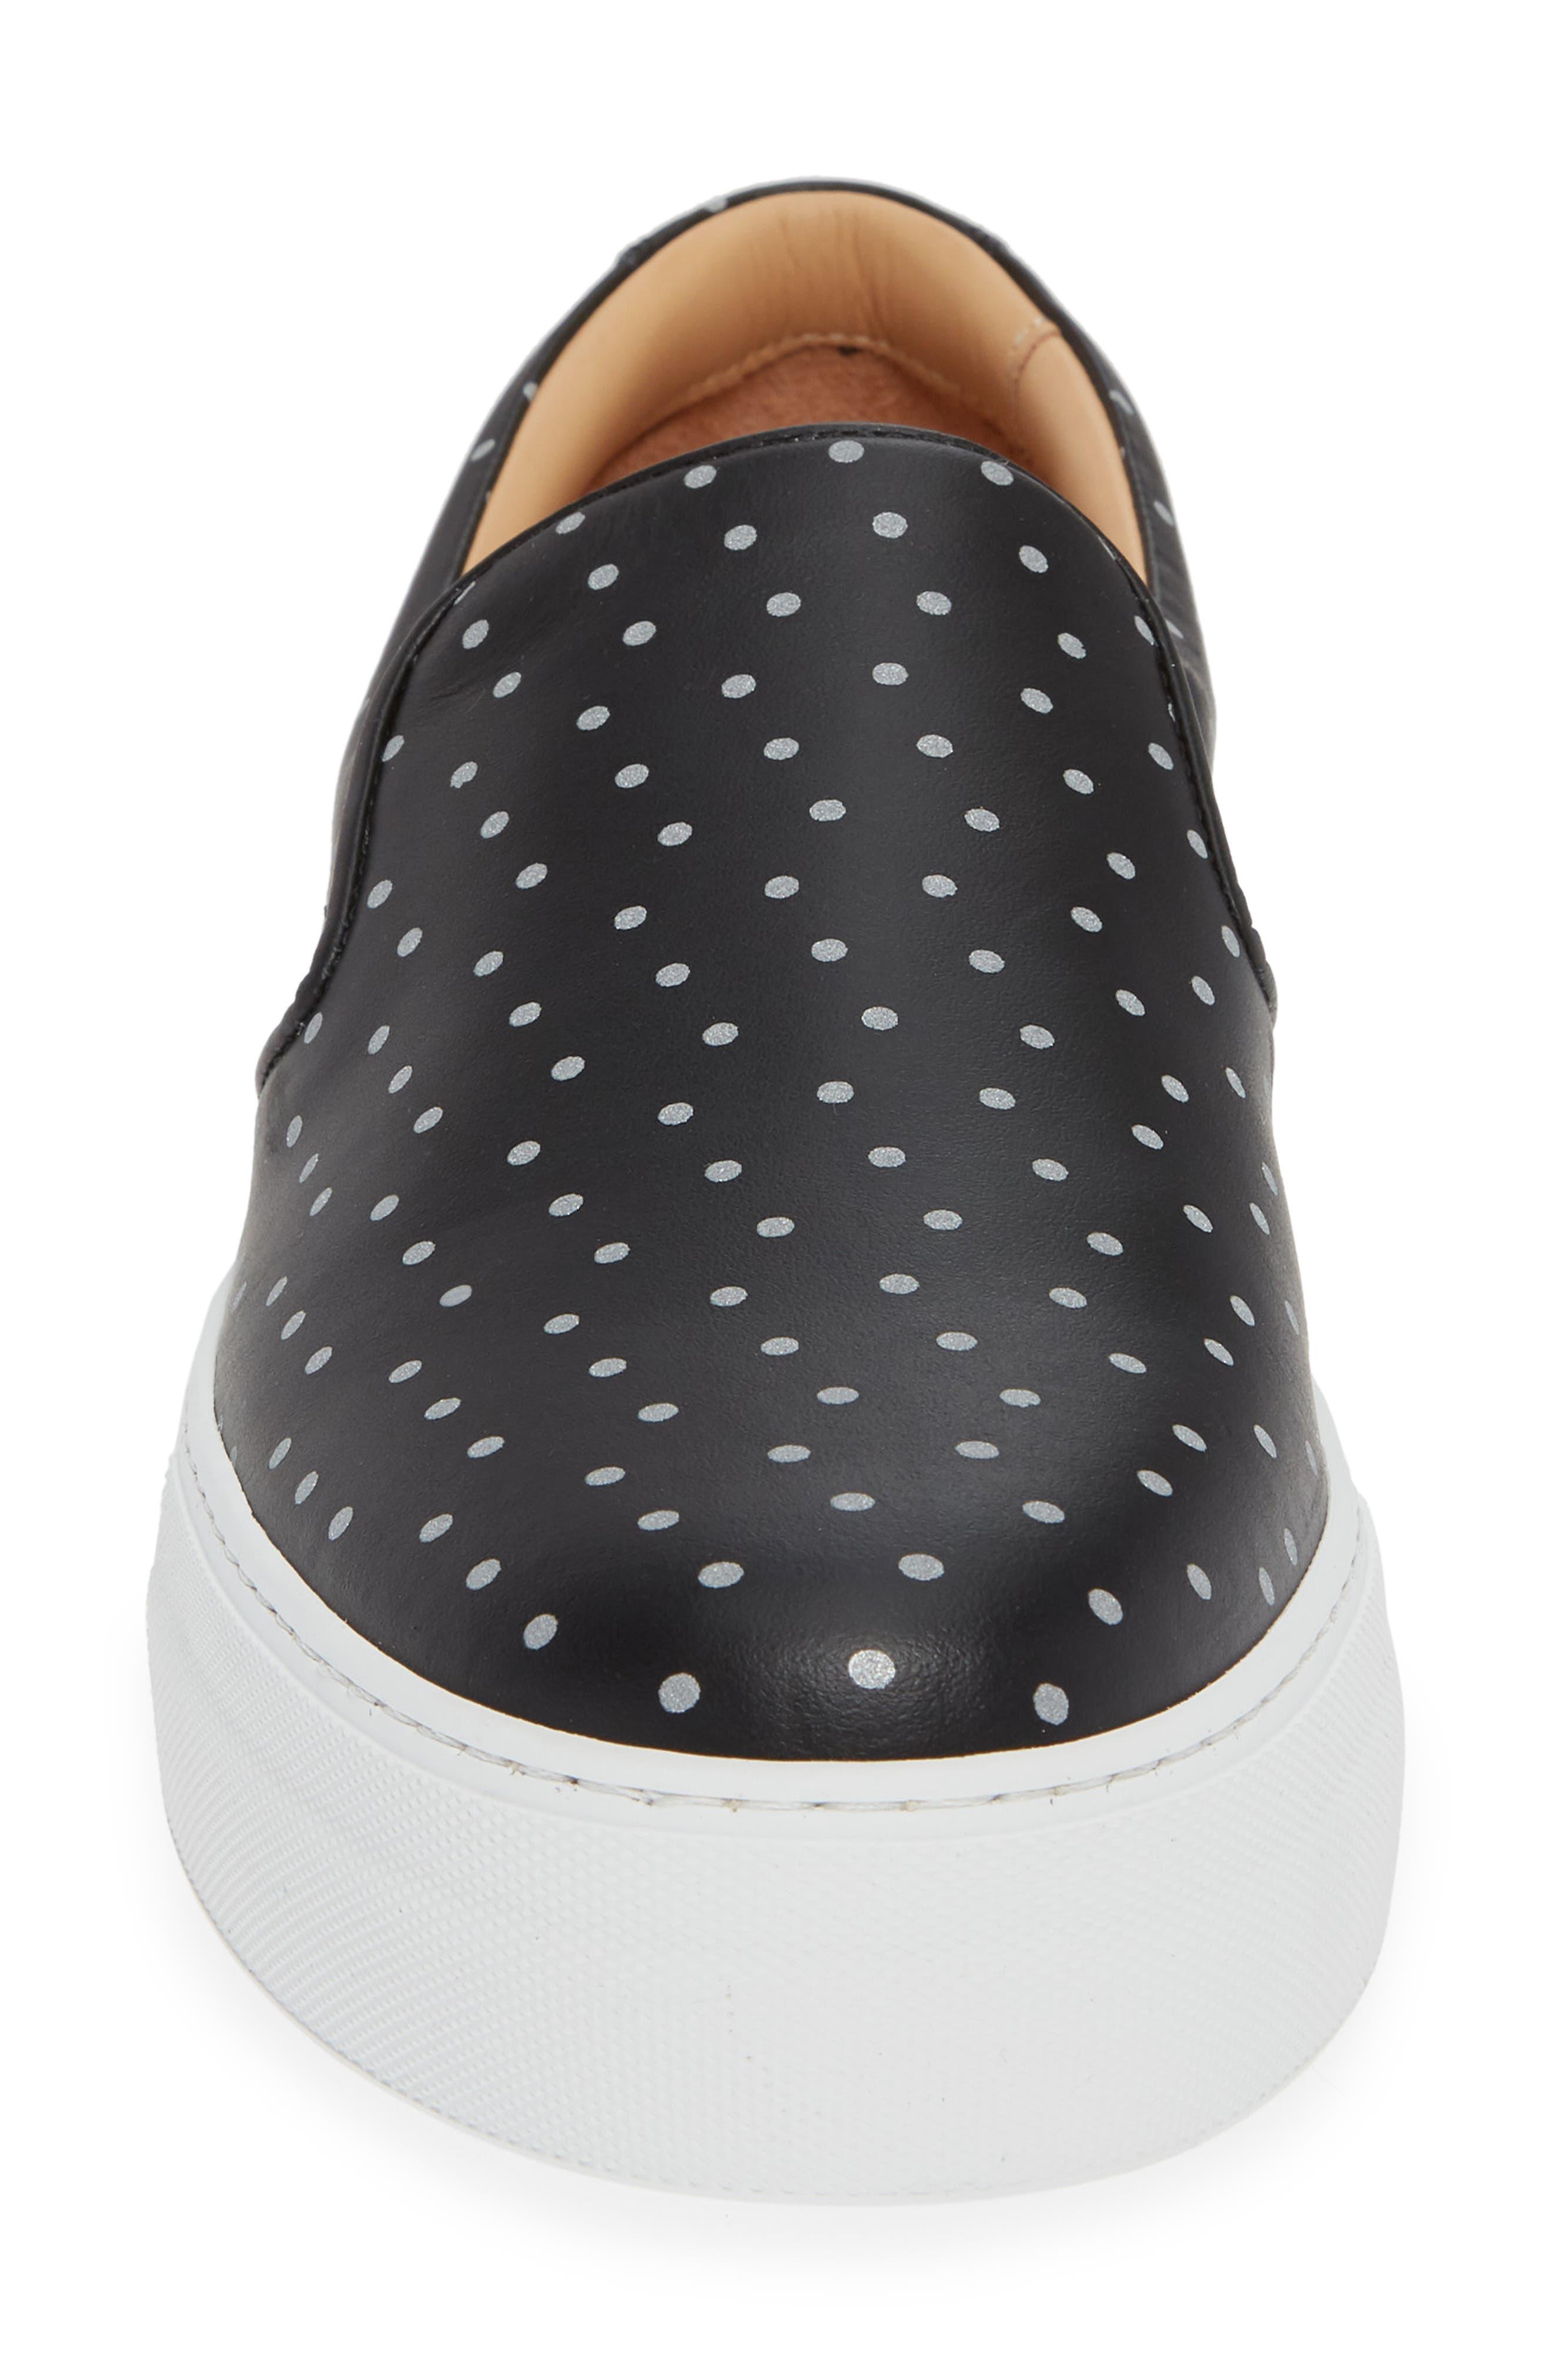 Nick Wooster x GREATS Slip-On Sneaker,                             Alternate thumbnail 4, color,                             BLACK W/ 3M DOTS